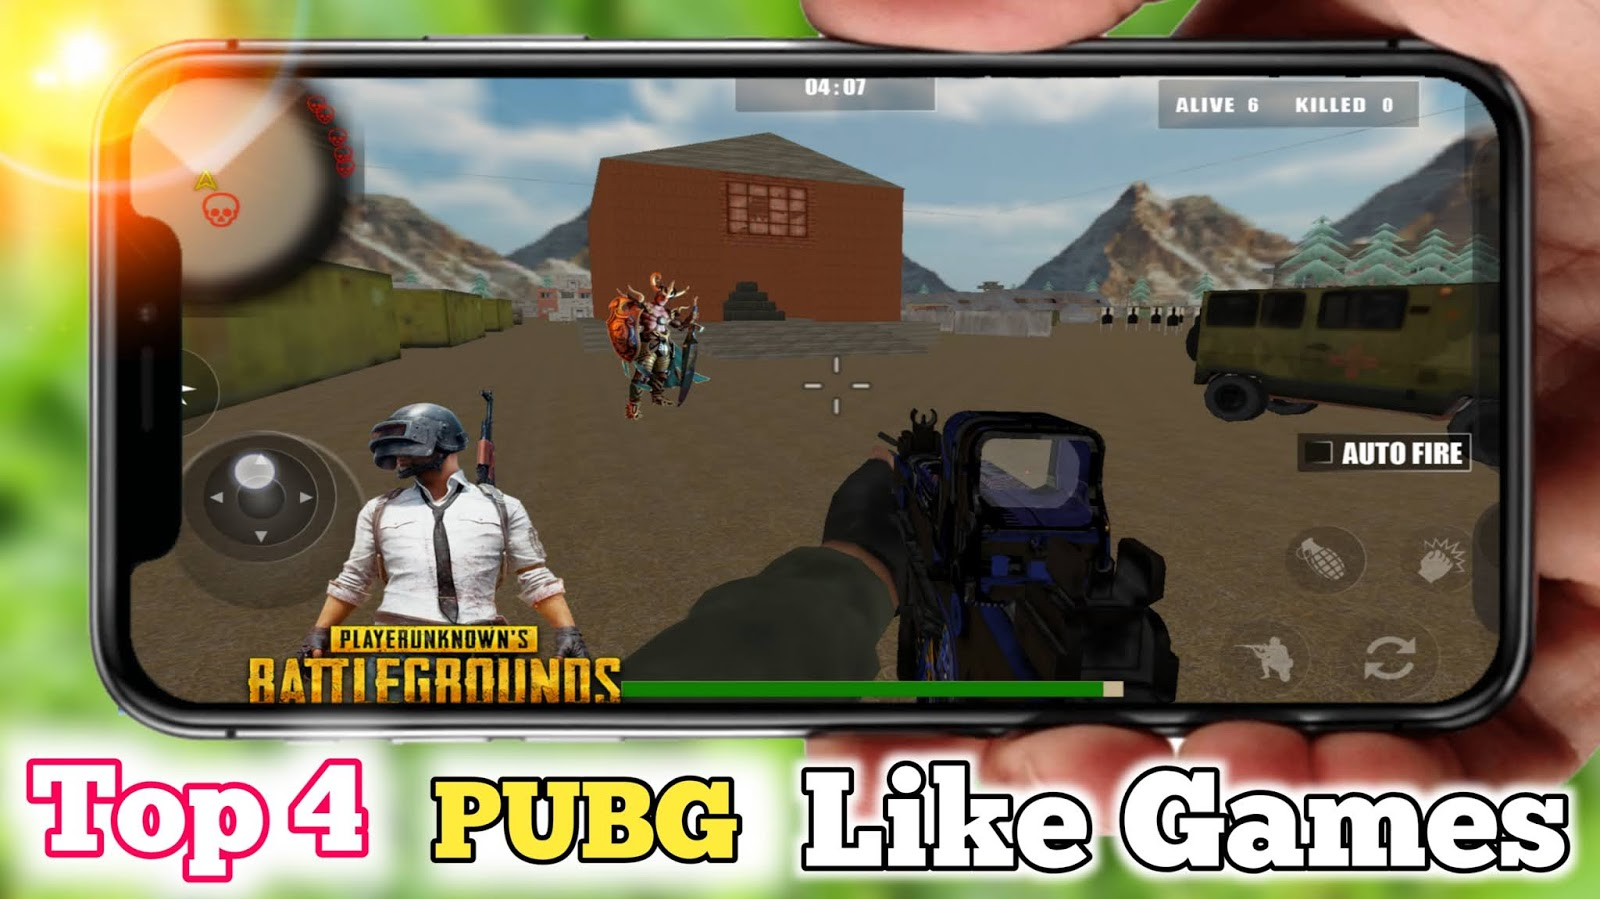 Top 4 Games Like Pubg Under 100 Mb Offline